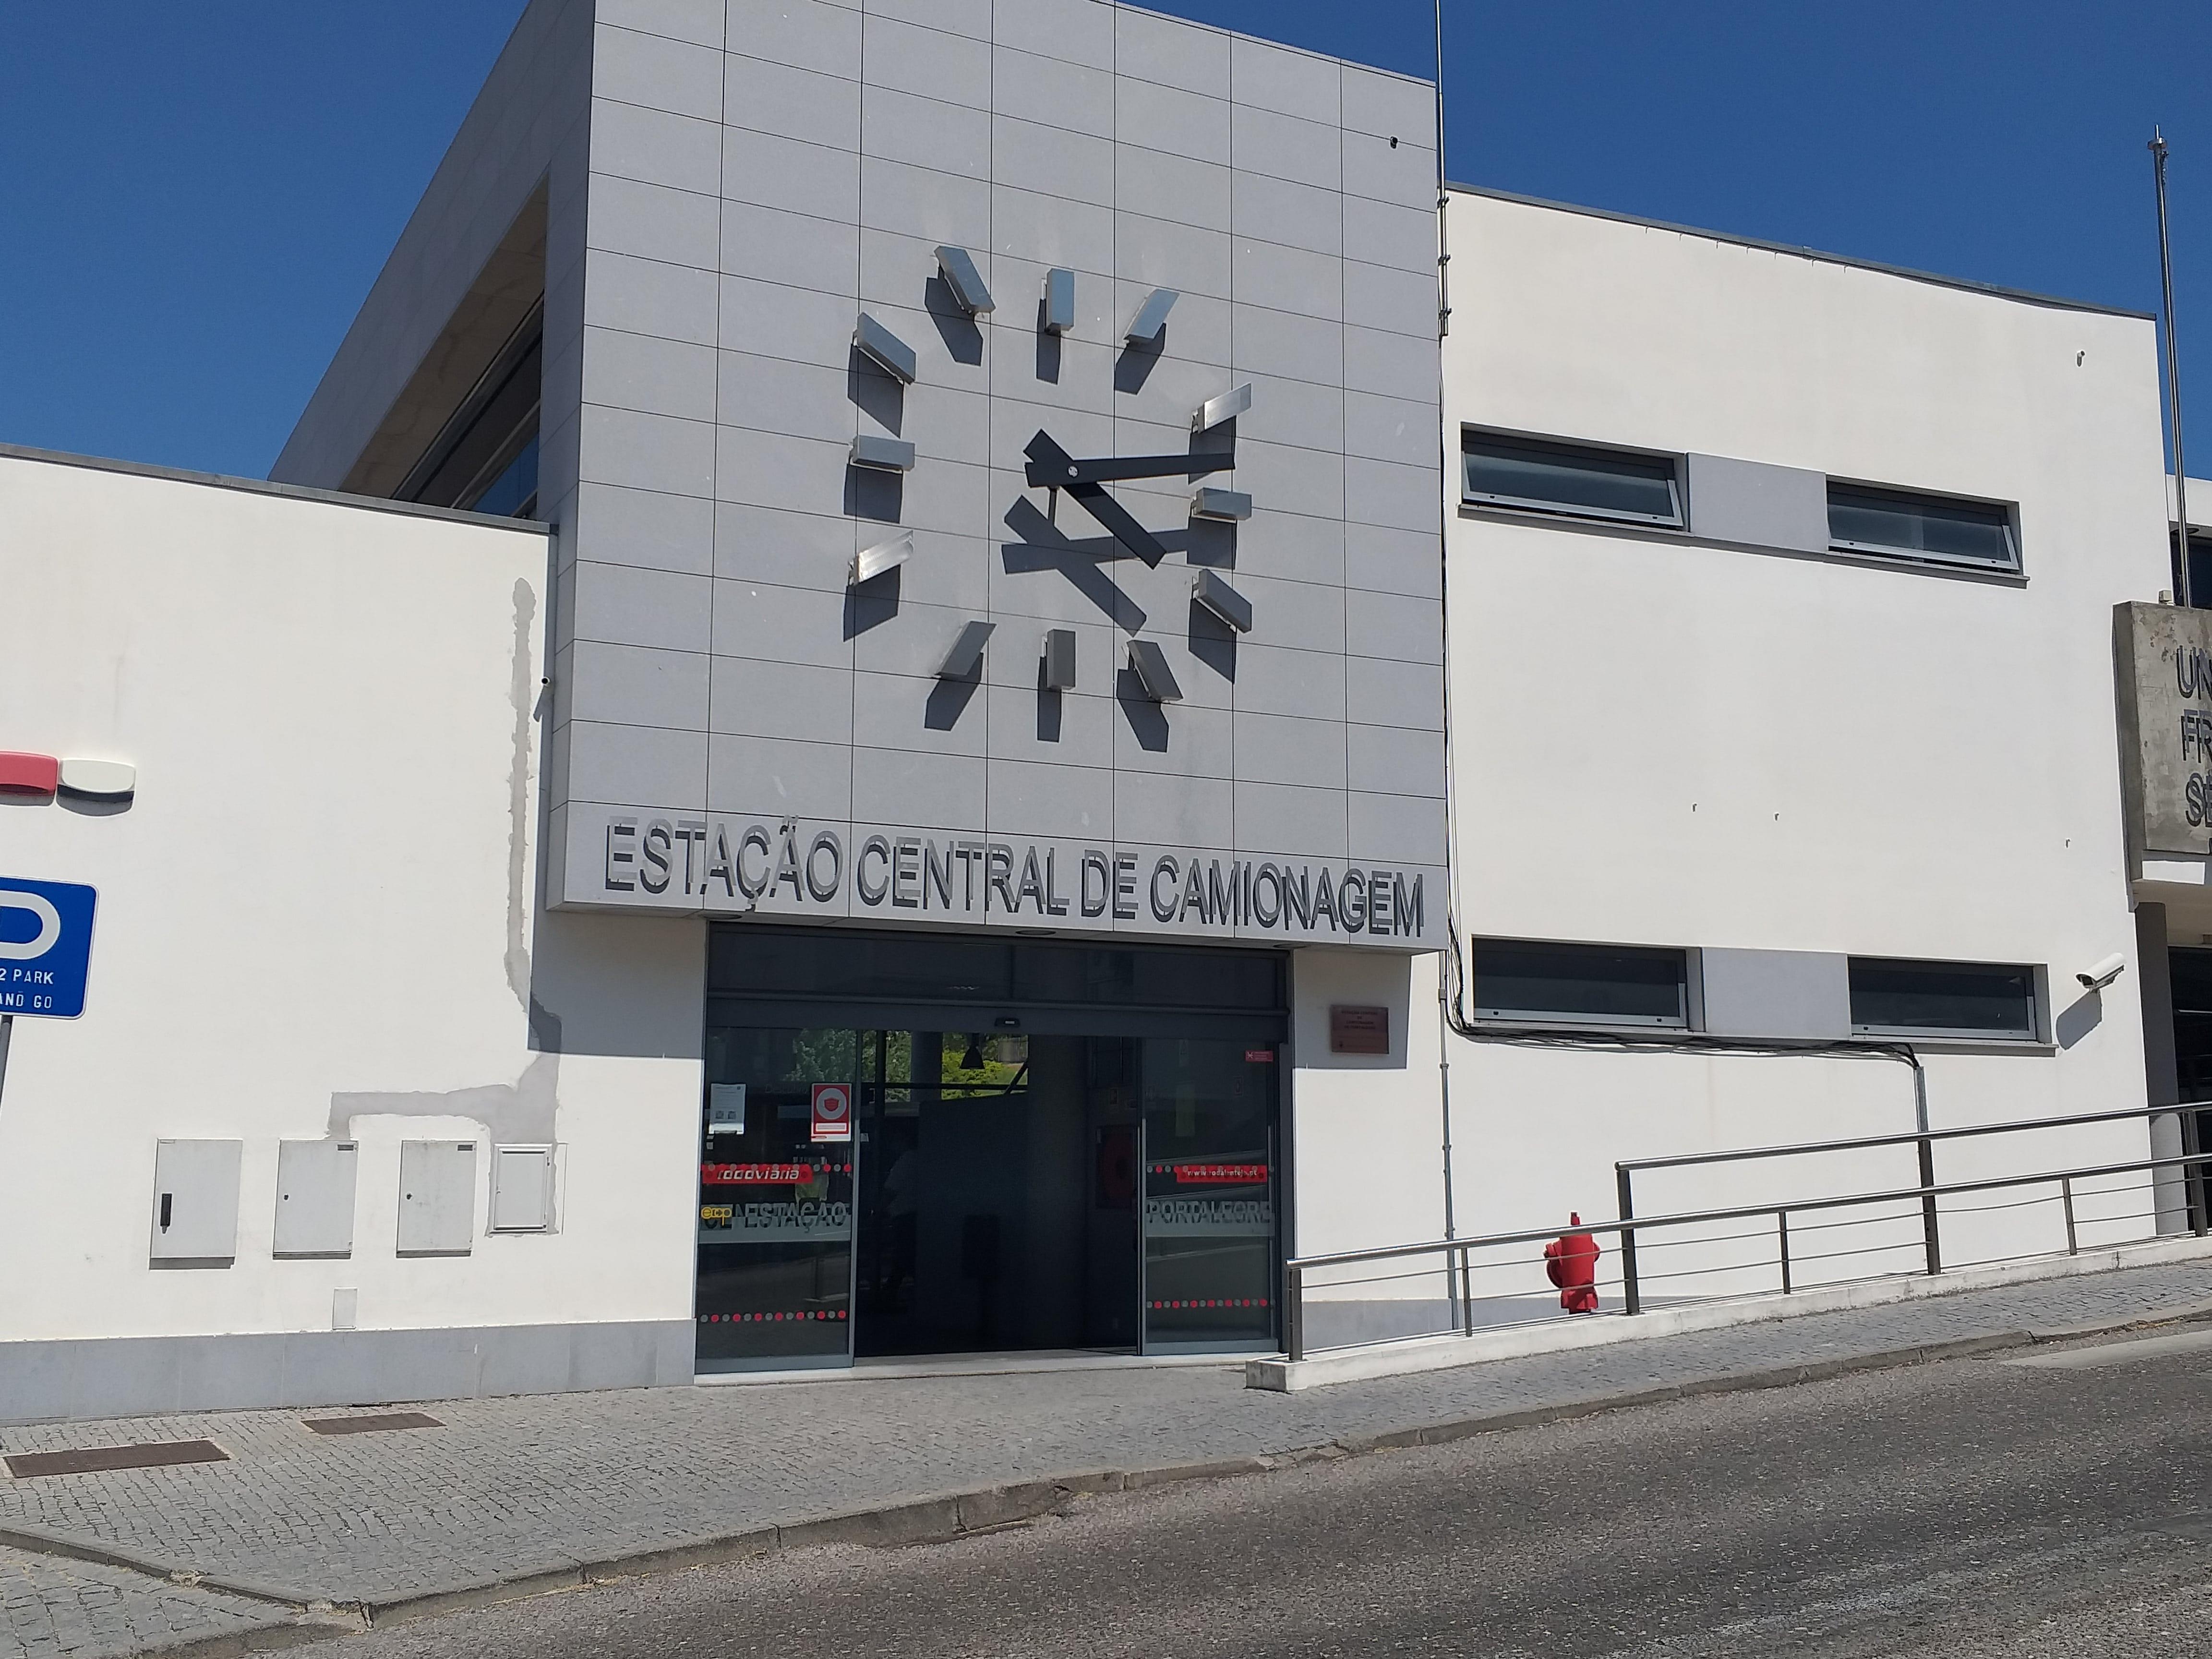 terminal rodoviario em portalegre_17072020-min